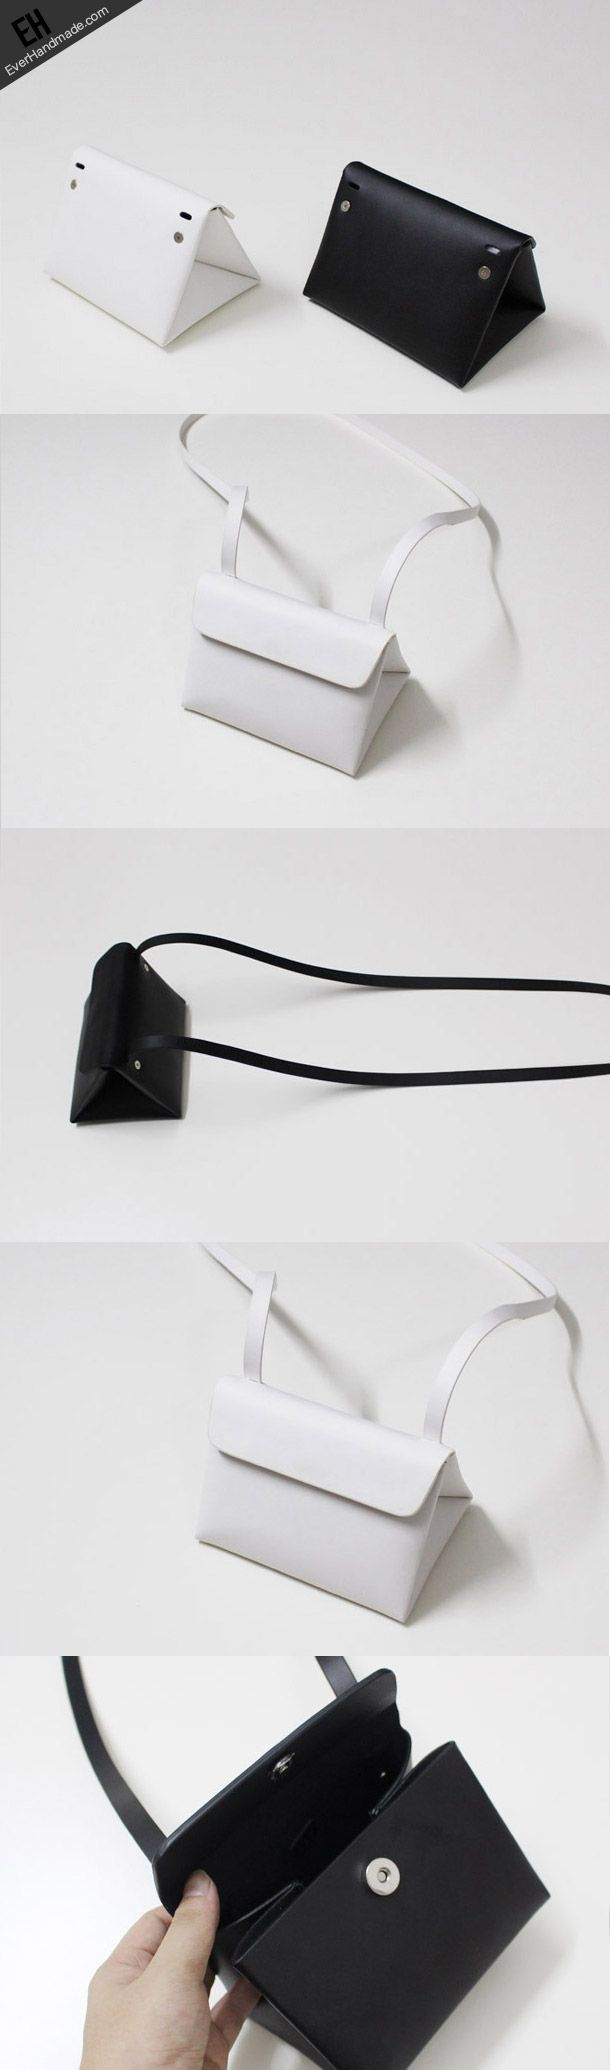 Leather Clutch bag shoulder bag triangle black white for women leather crossbody bag